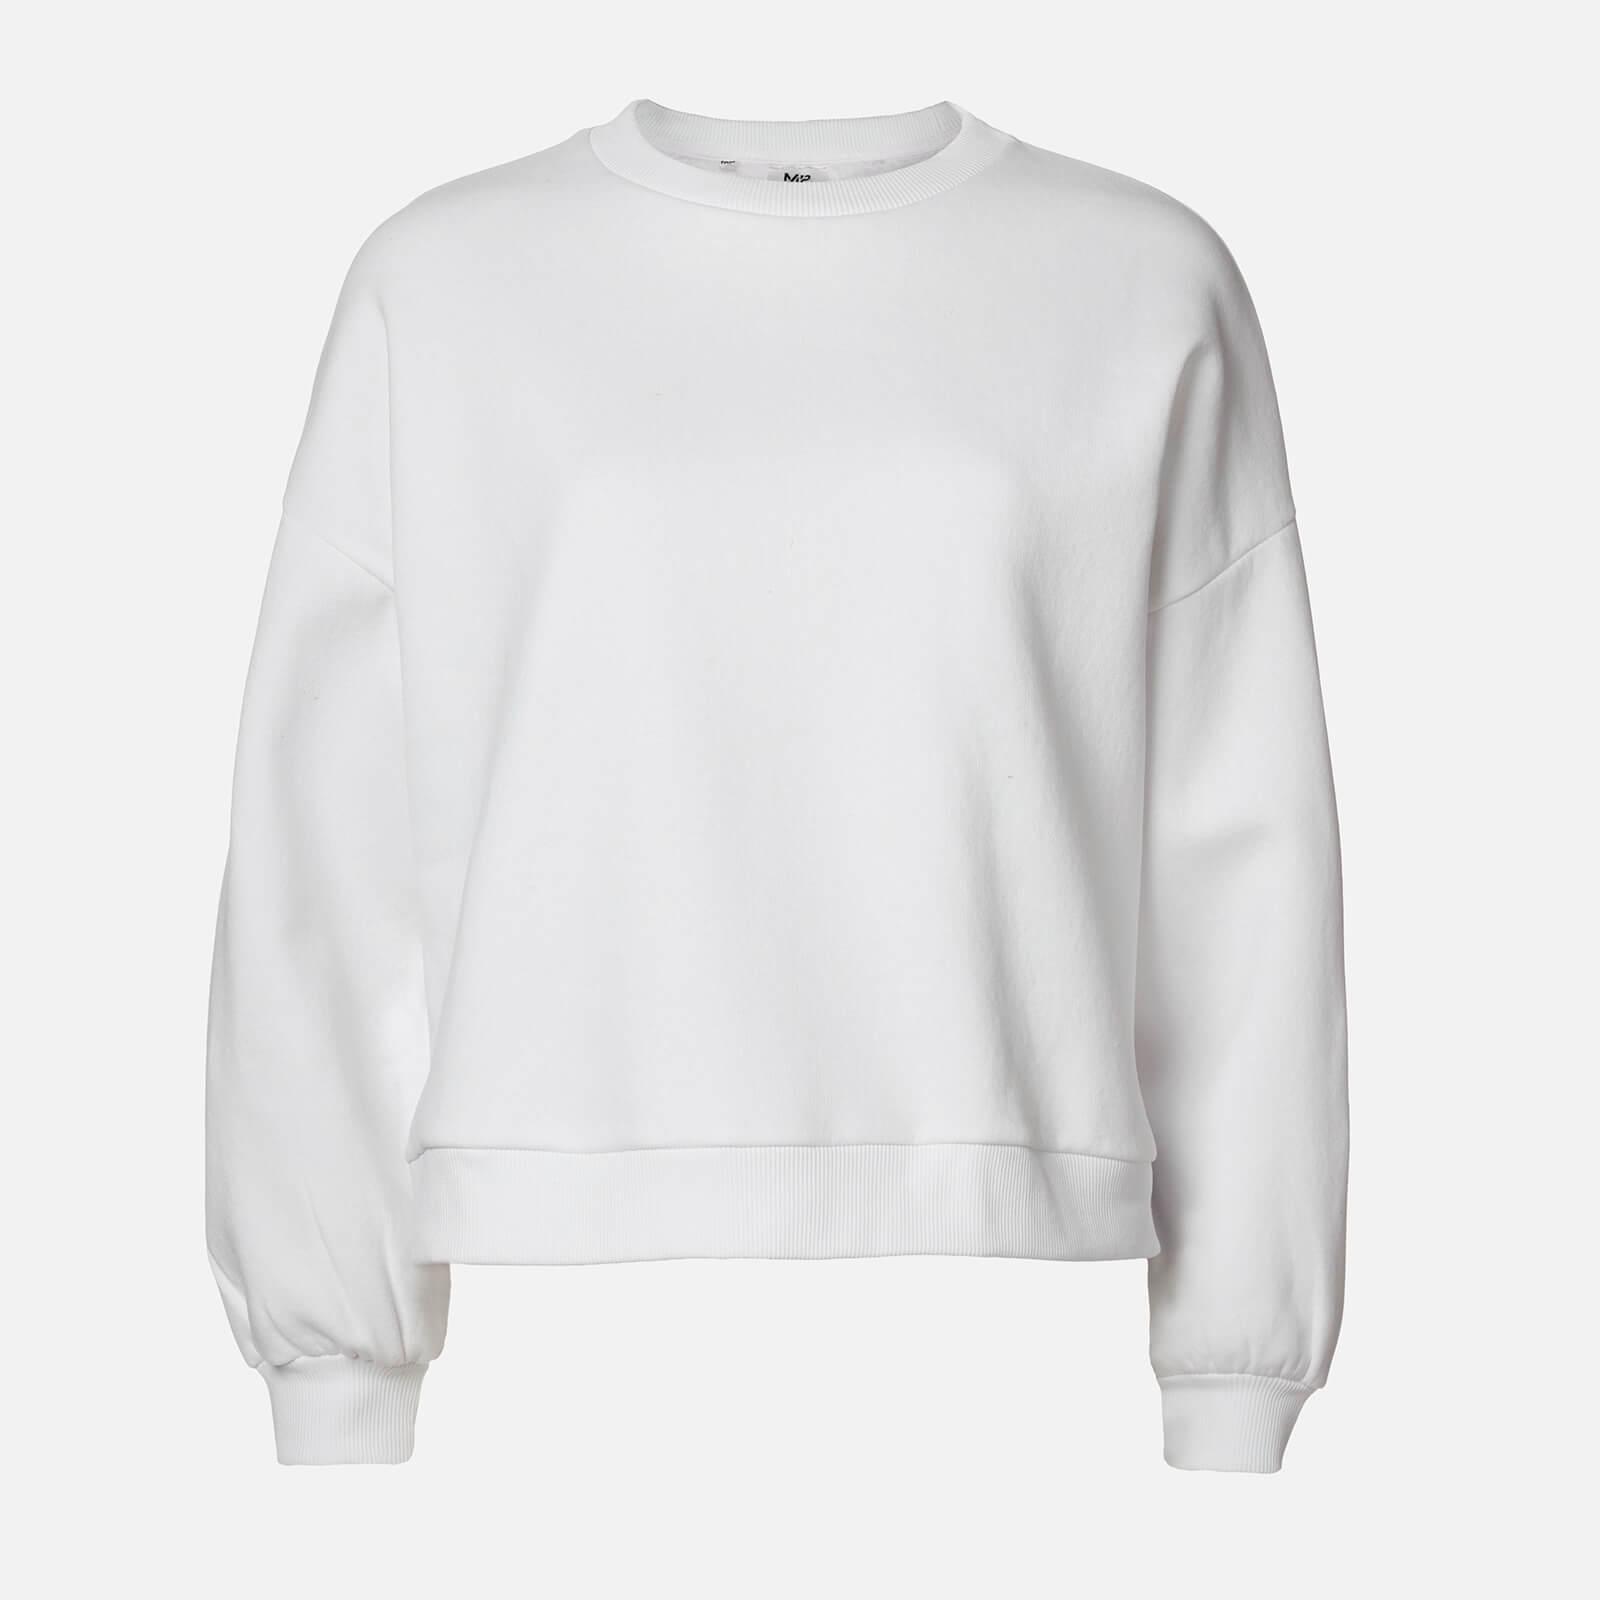 Myprotein Oversized Sweatshirt - Vit - XS